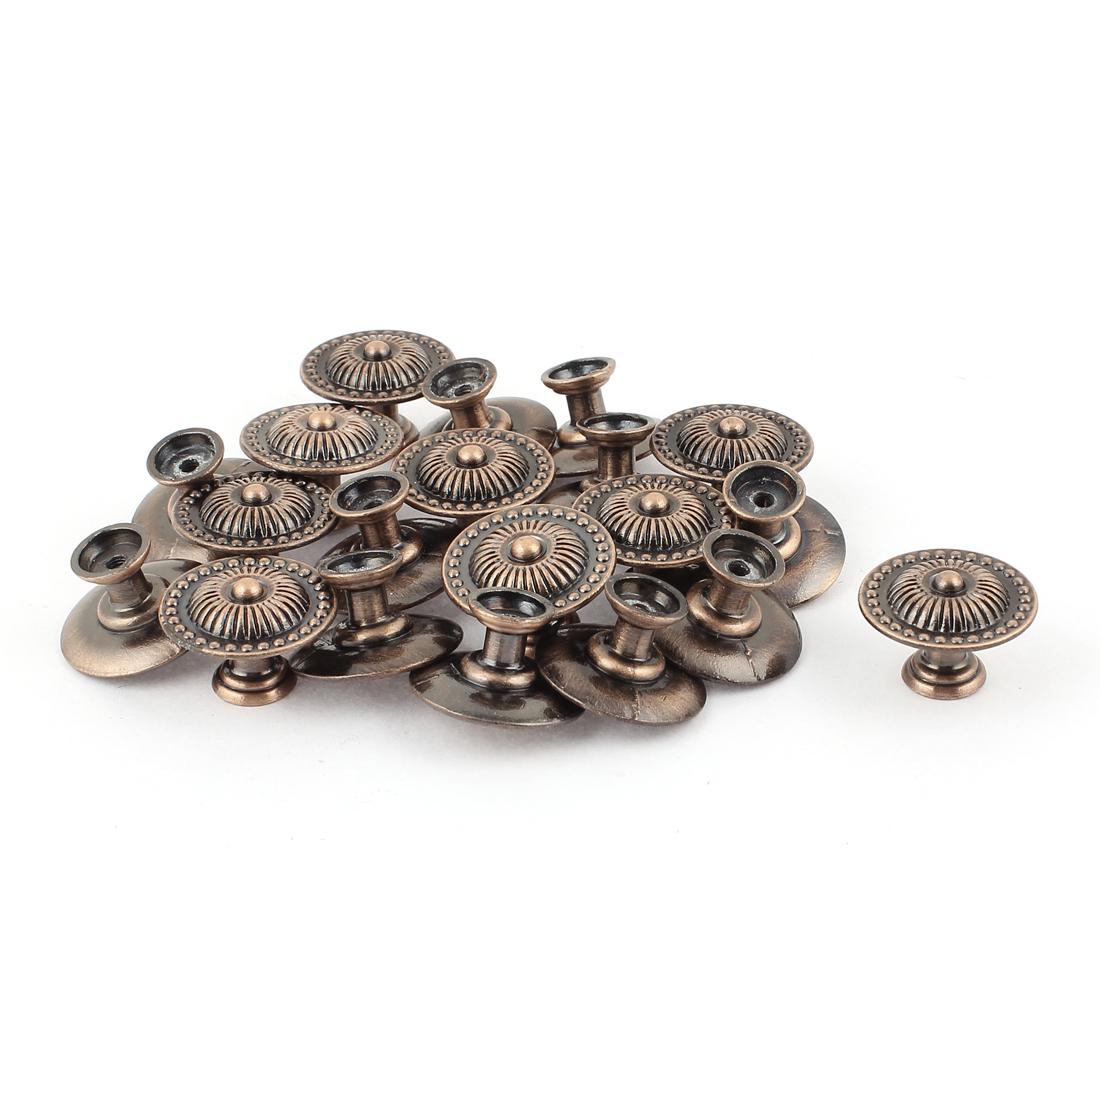 Door Drawer Dresser Cupboard Metal Round Pull Knobs Handle Hardware 20pcs